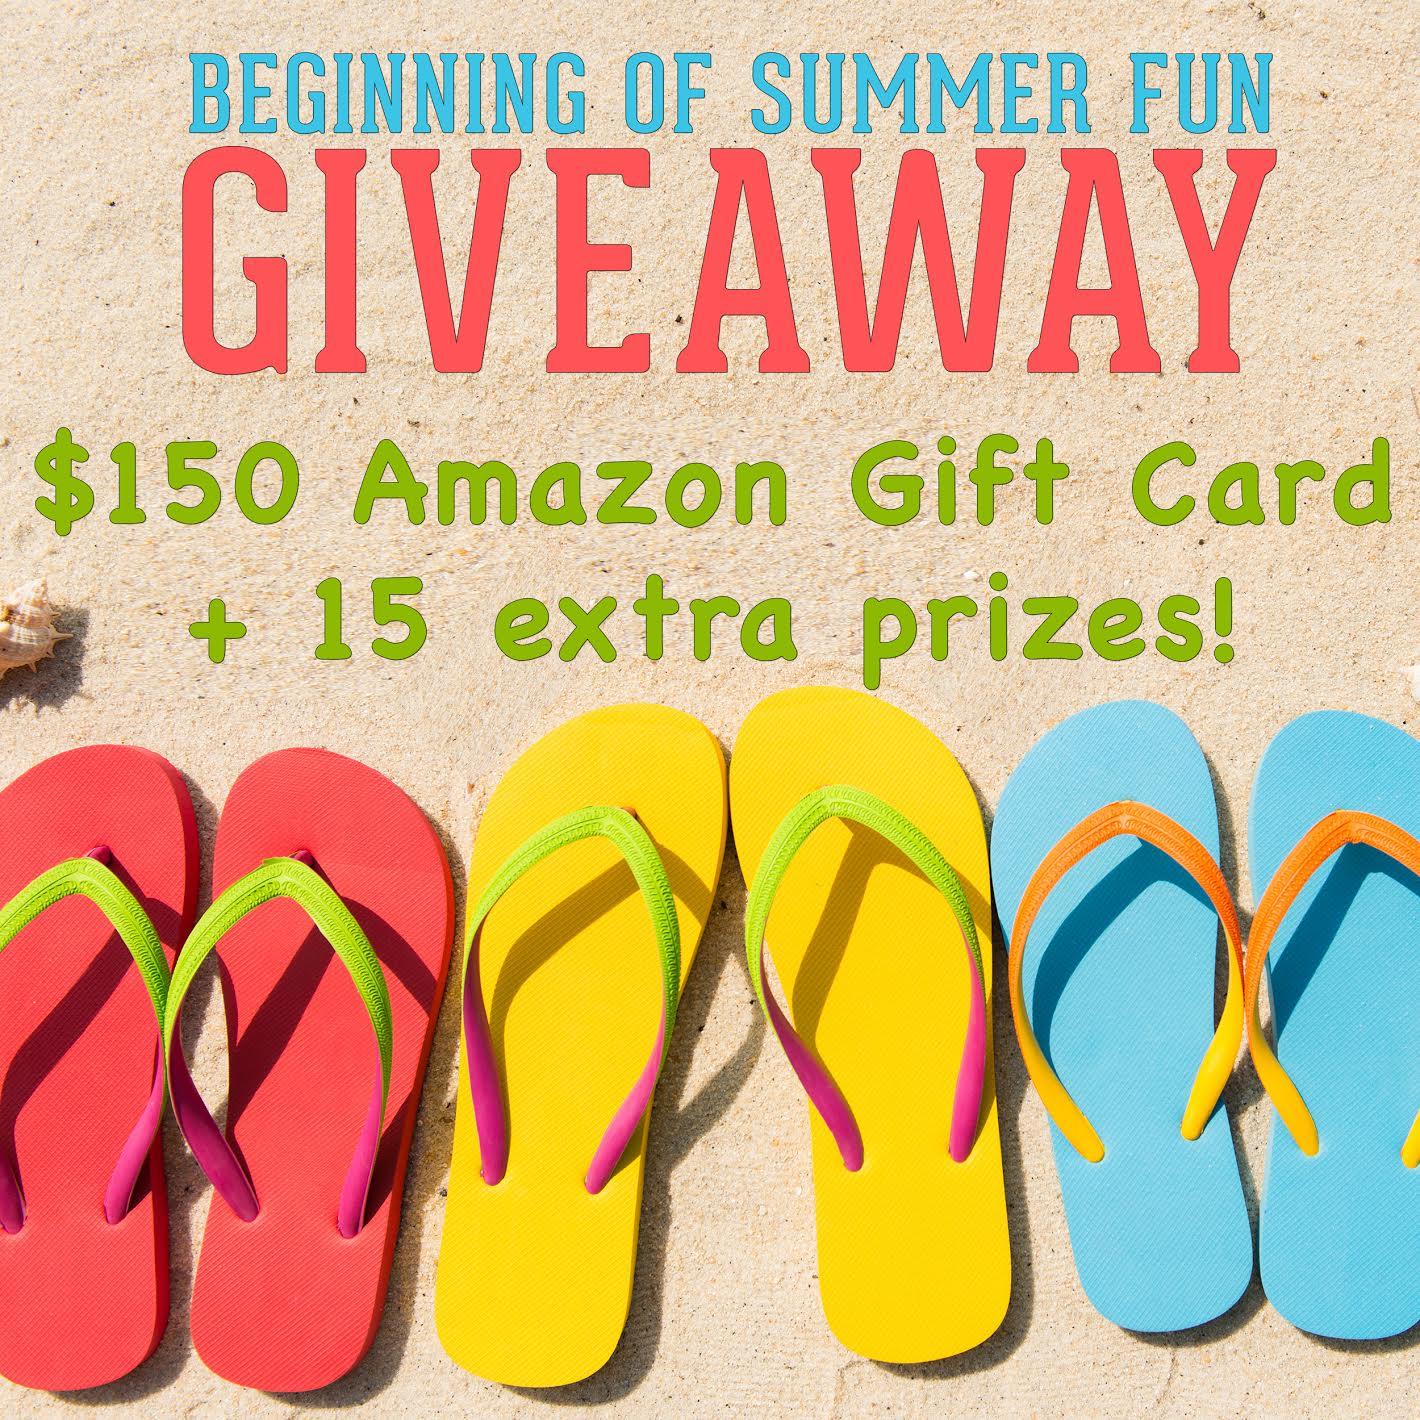 Summer Fun Giveaway!